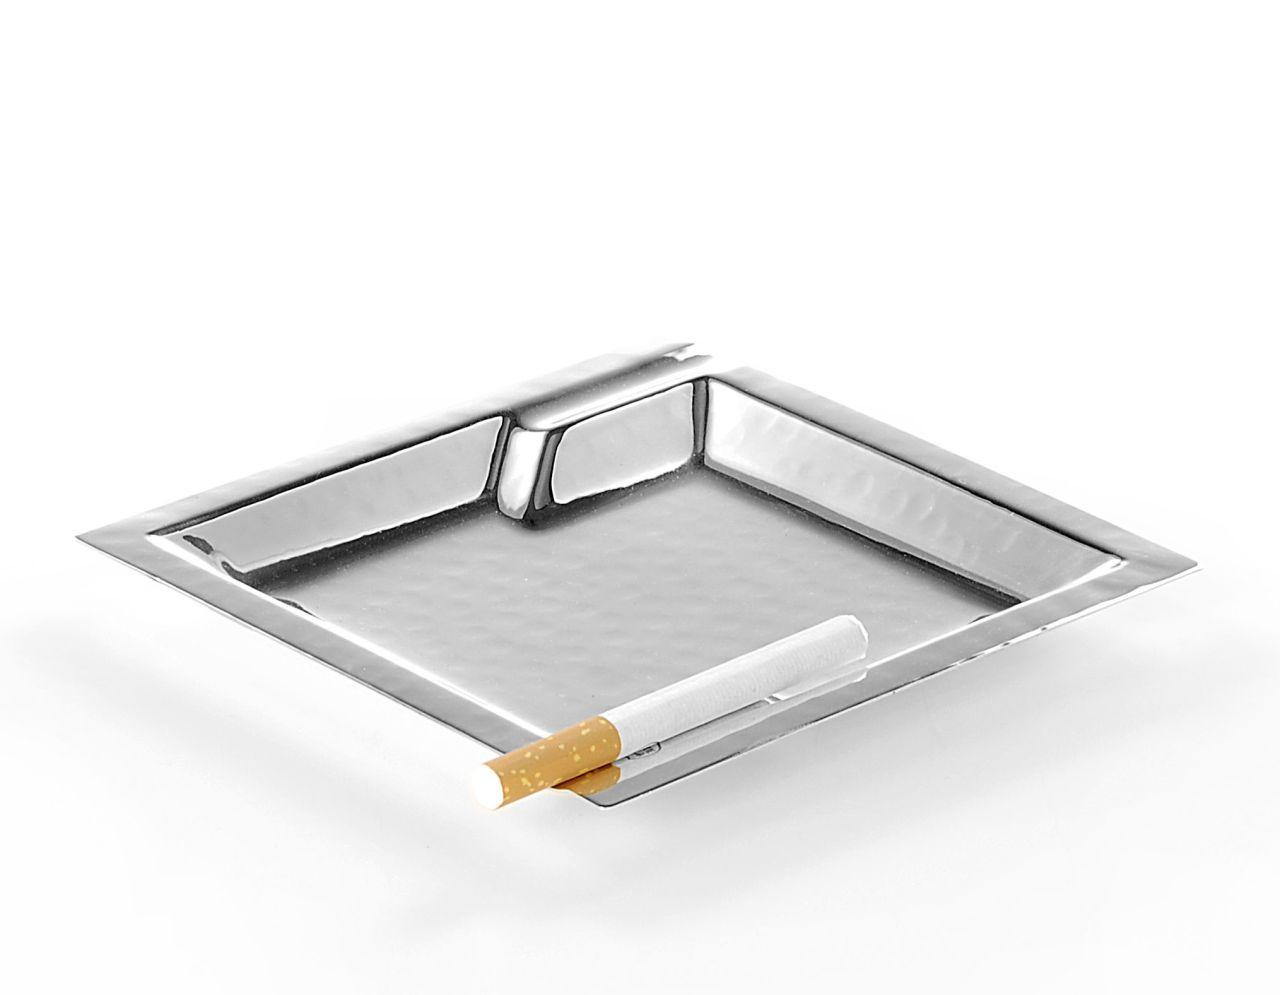 Posacenere quadrato placcato argento cm.14x14x1,5h